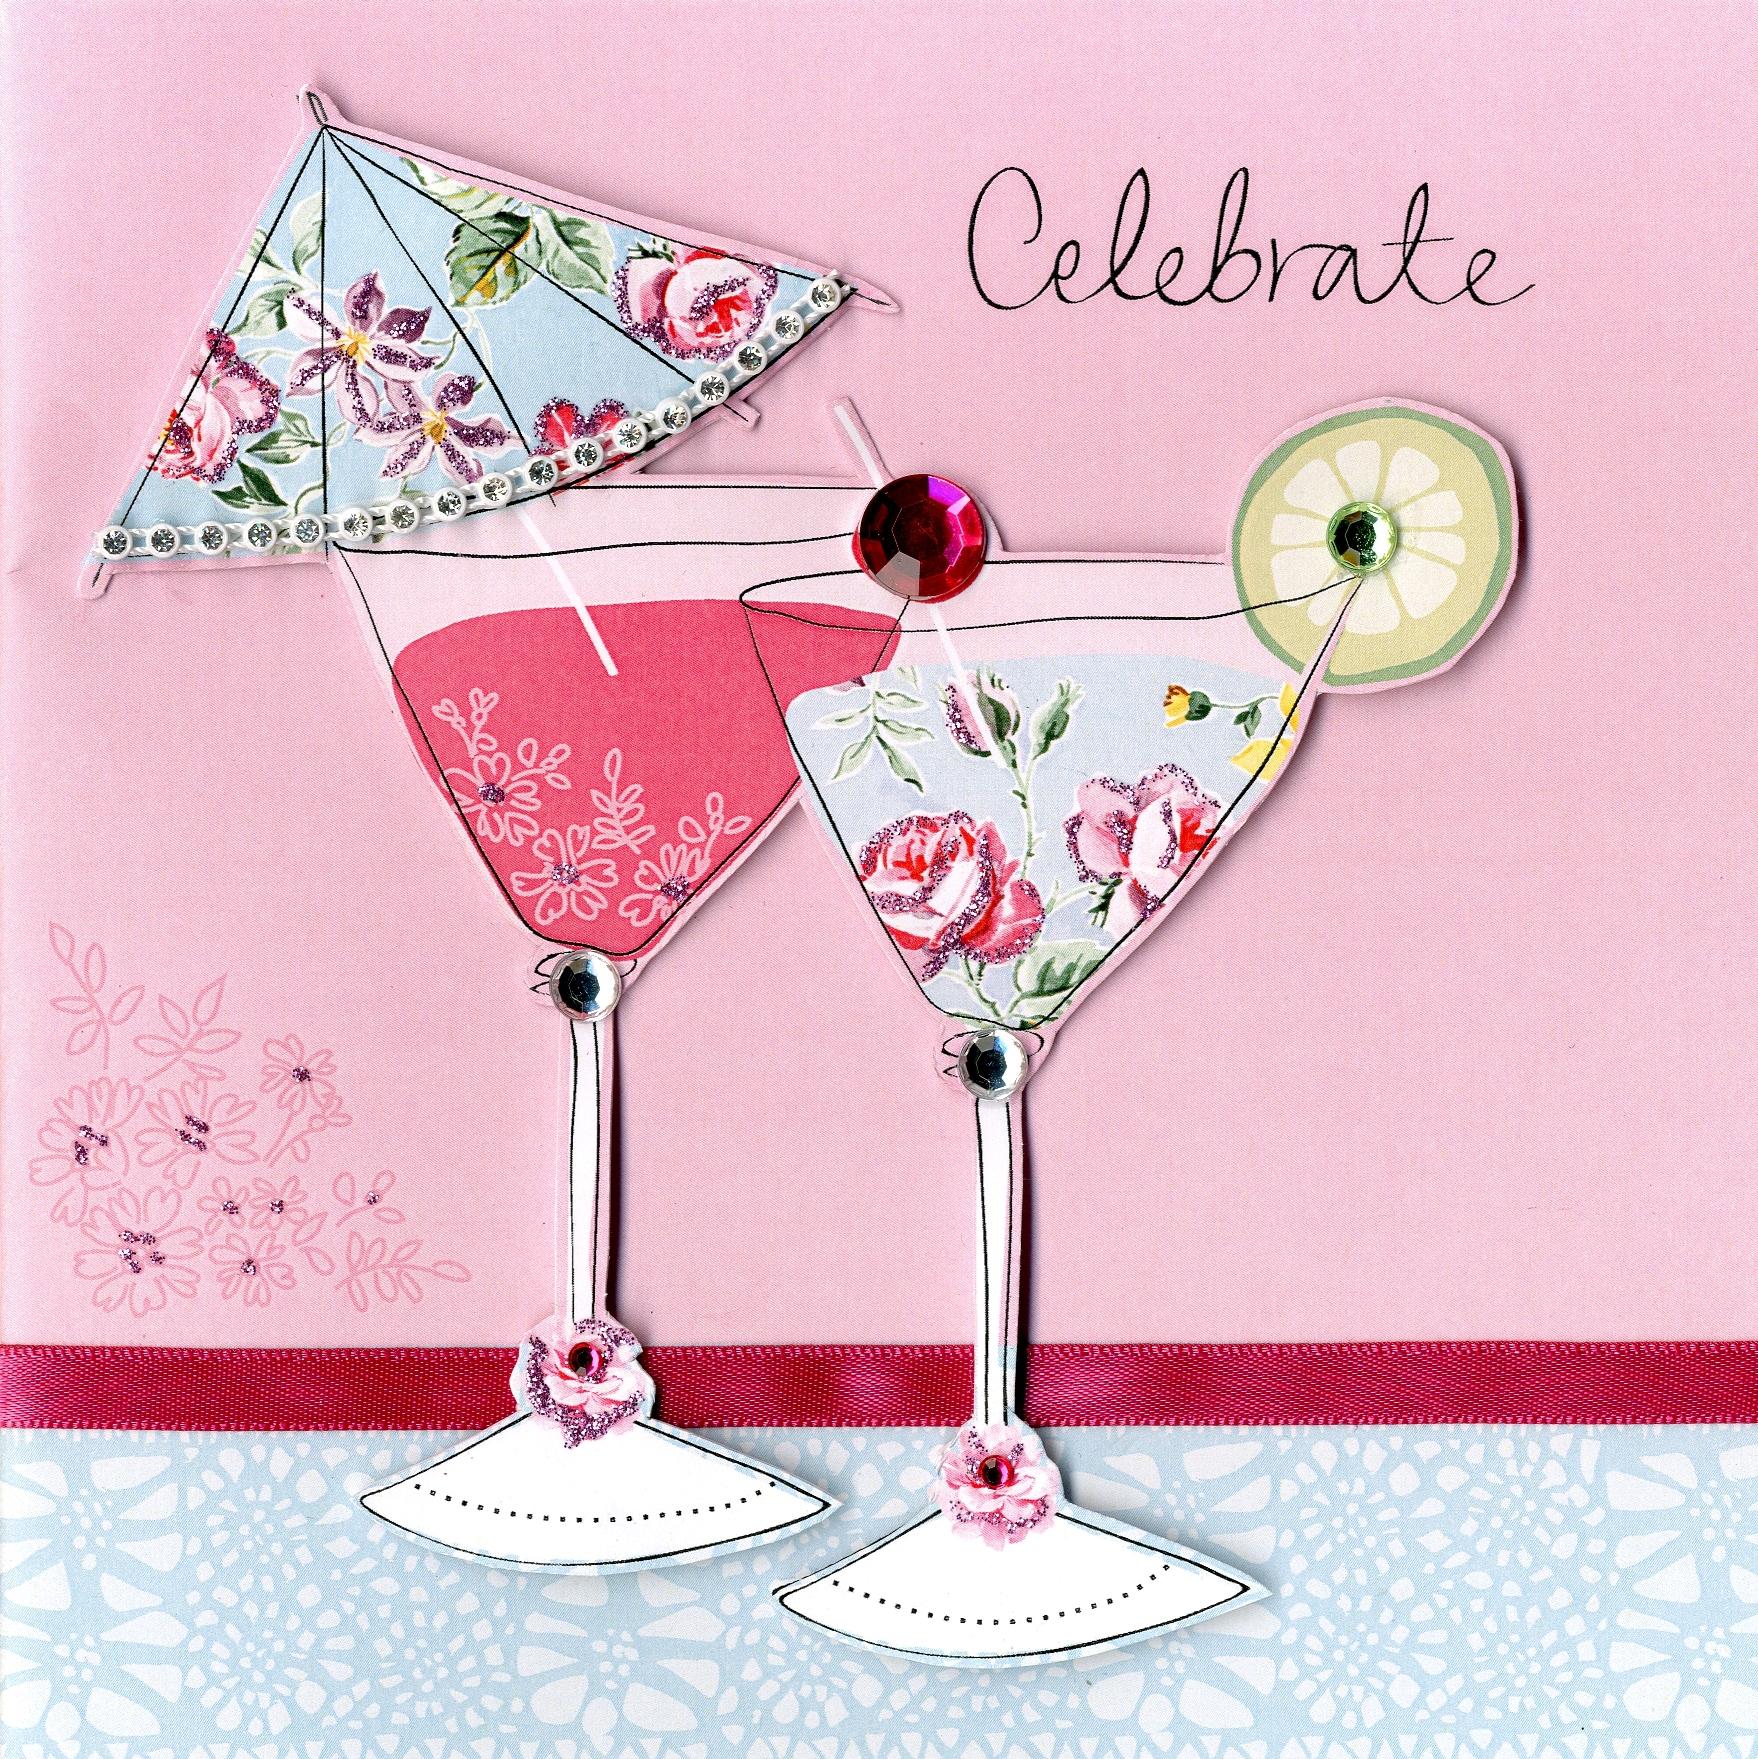 embellished cocktail celebrate birthday card cards love kates